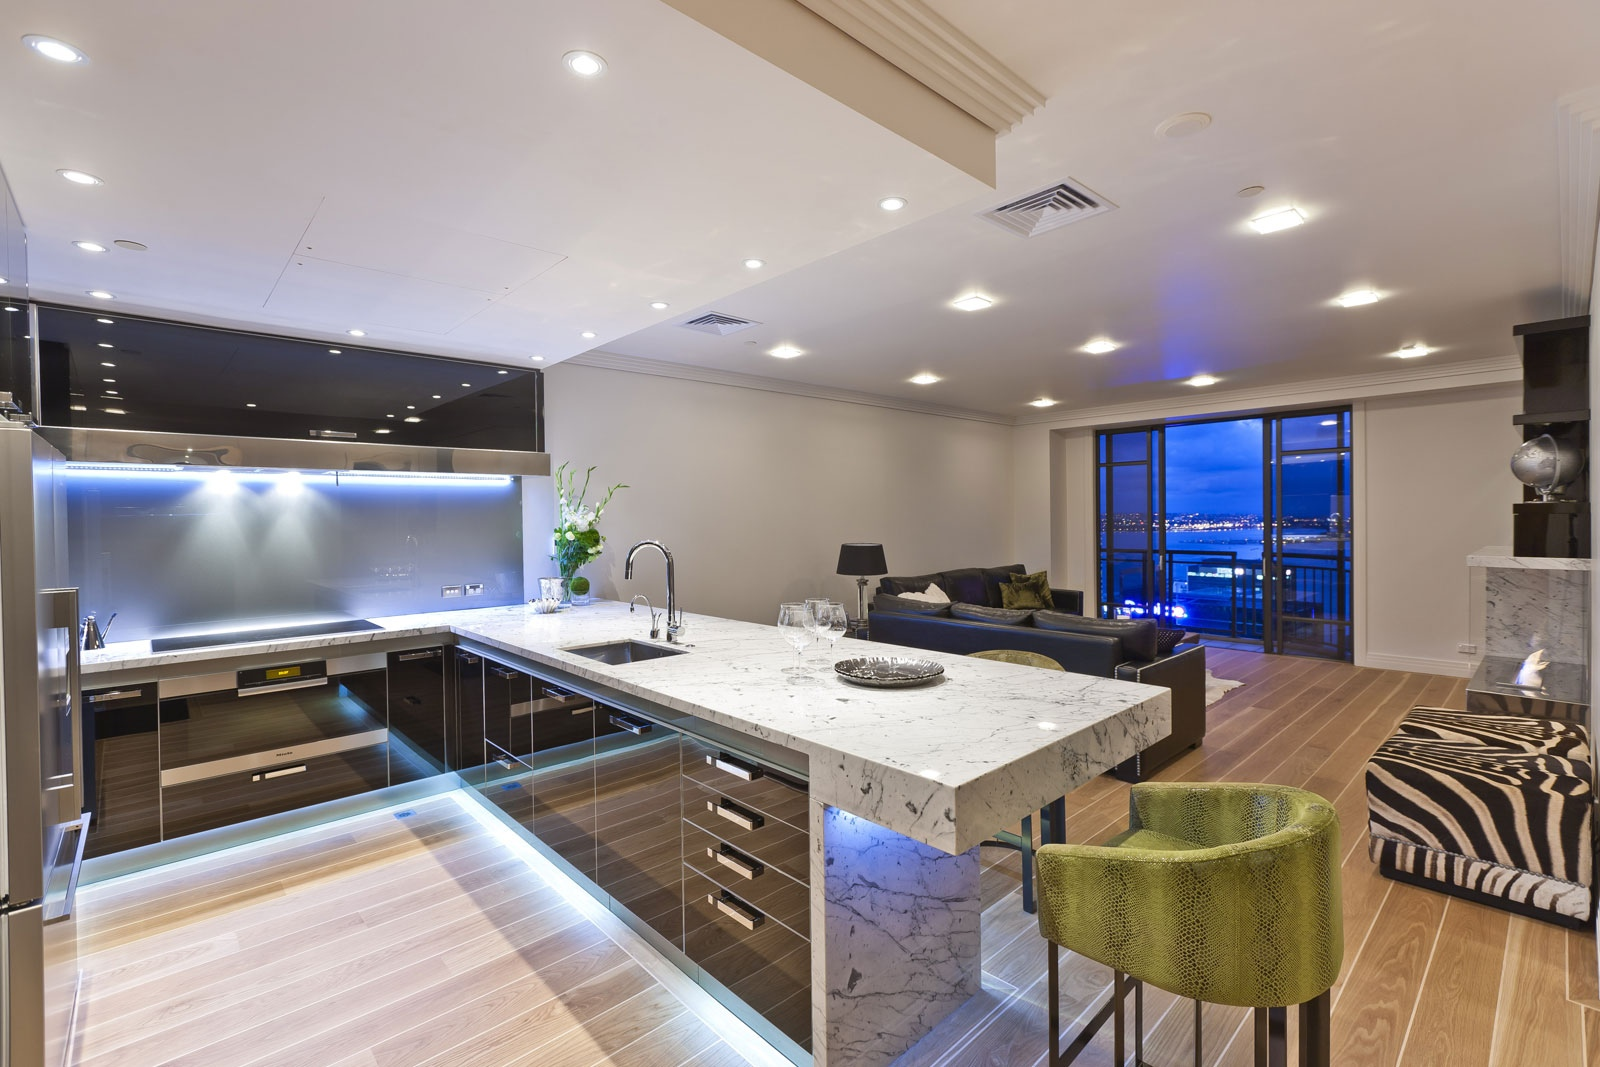 17 light filled modern kitchens by mal corboy modern kitchen lighting